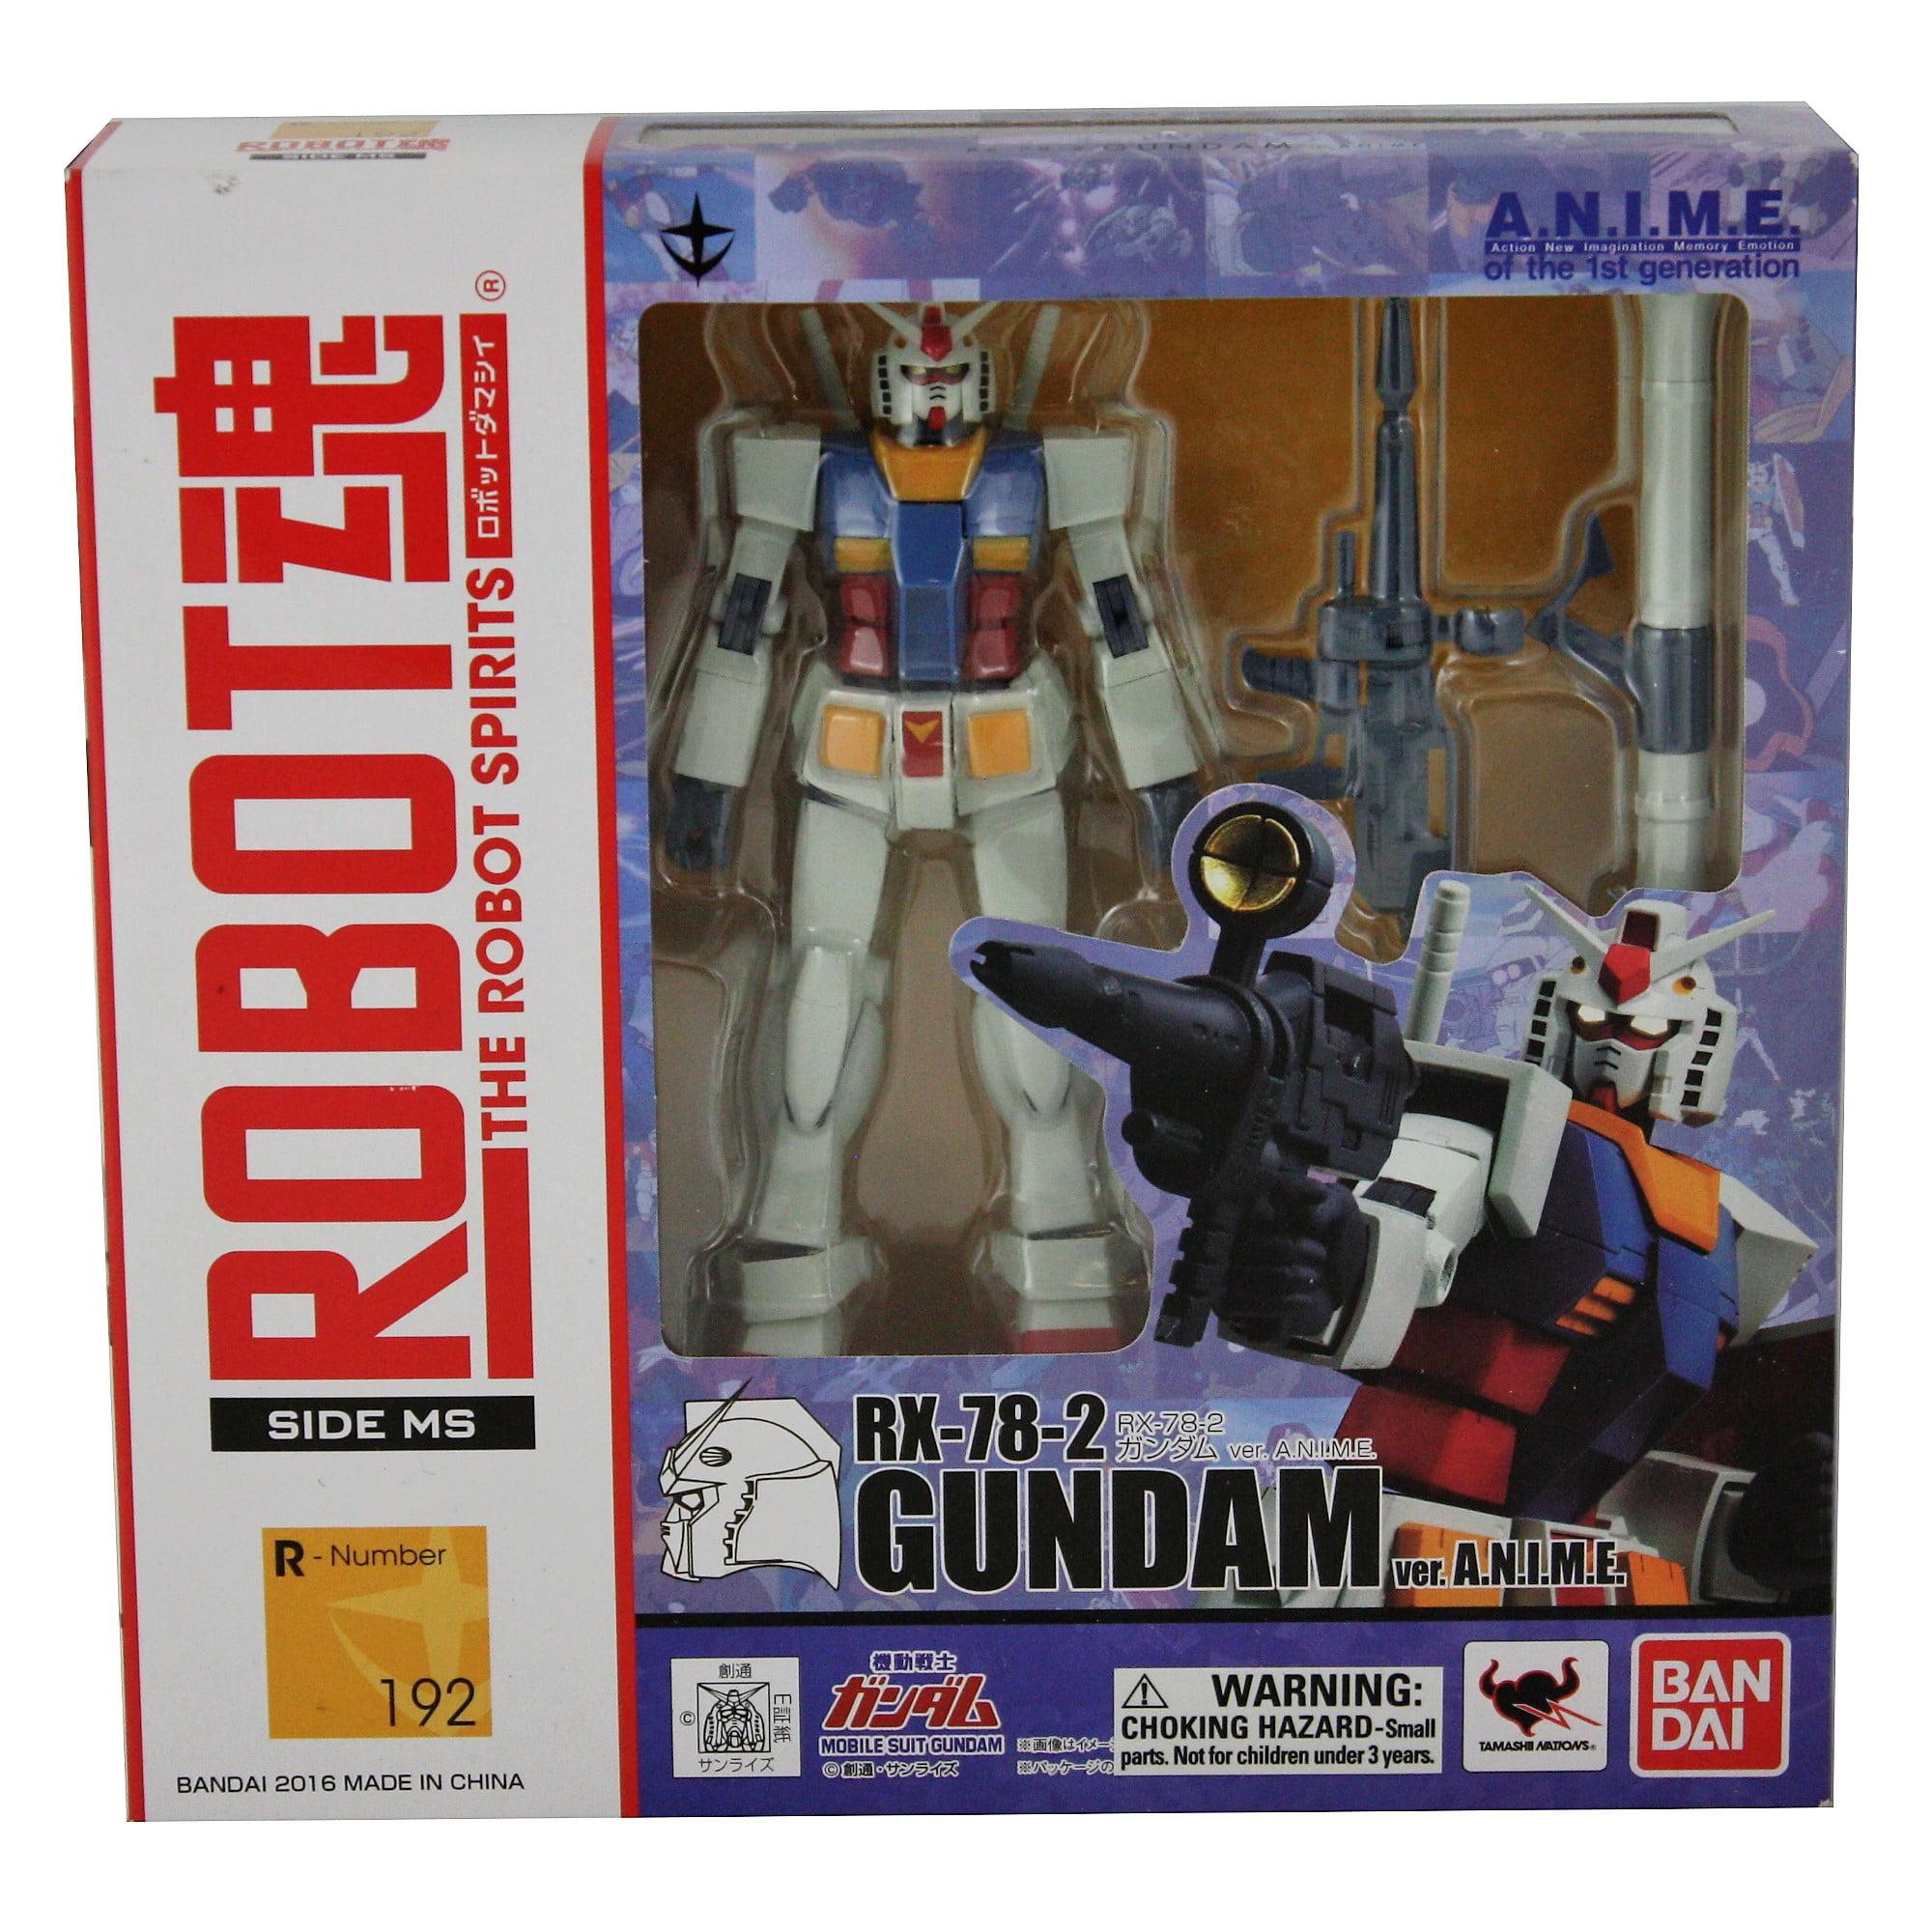 Bandai Tamashii Nations RX-78-2 Ver. A.N.I.M.E. Mobile Suit Gundam Bandai Robot Spirits Action Toy Figure by Bandai